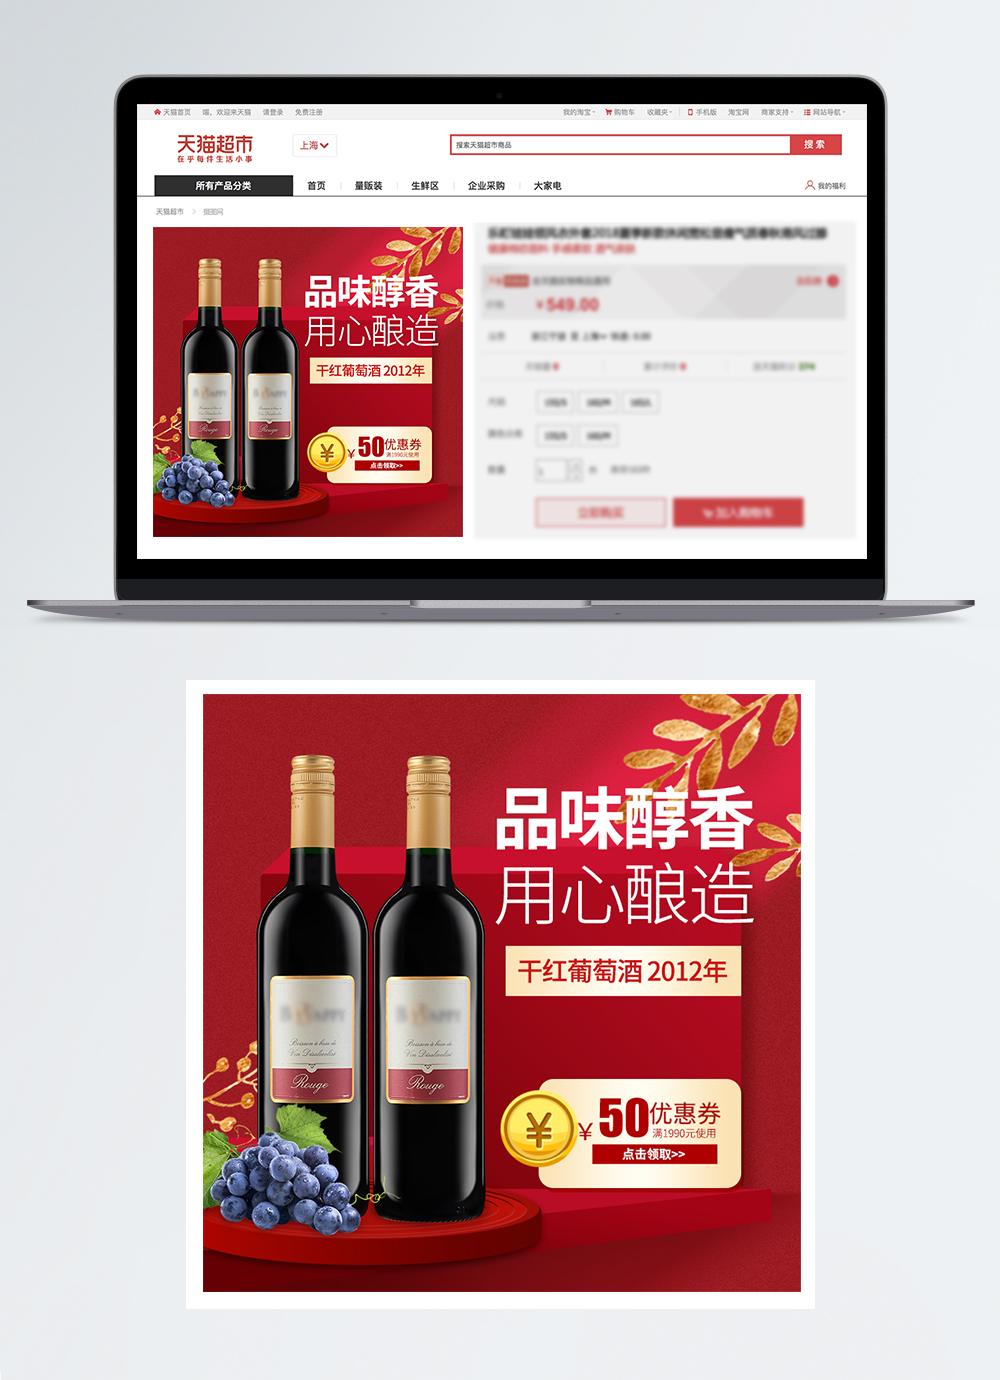 64+ Gambar Anggur Merah Di Kulkas HD